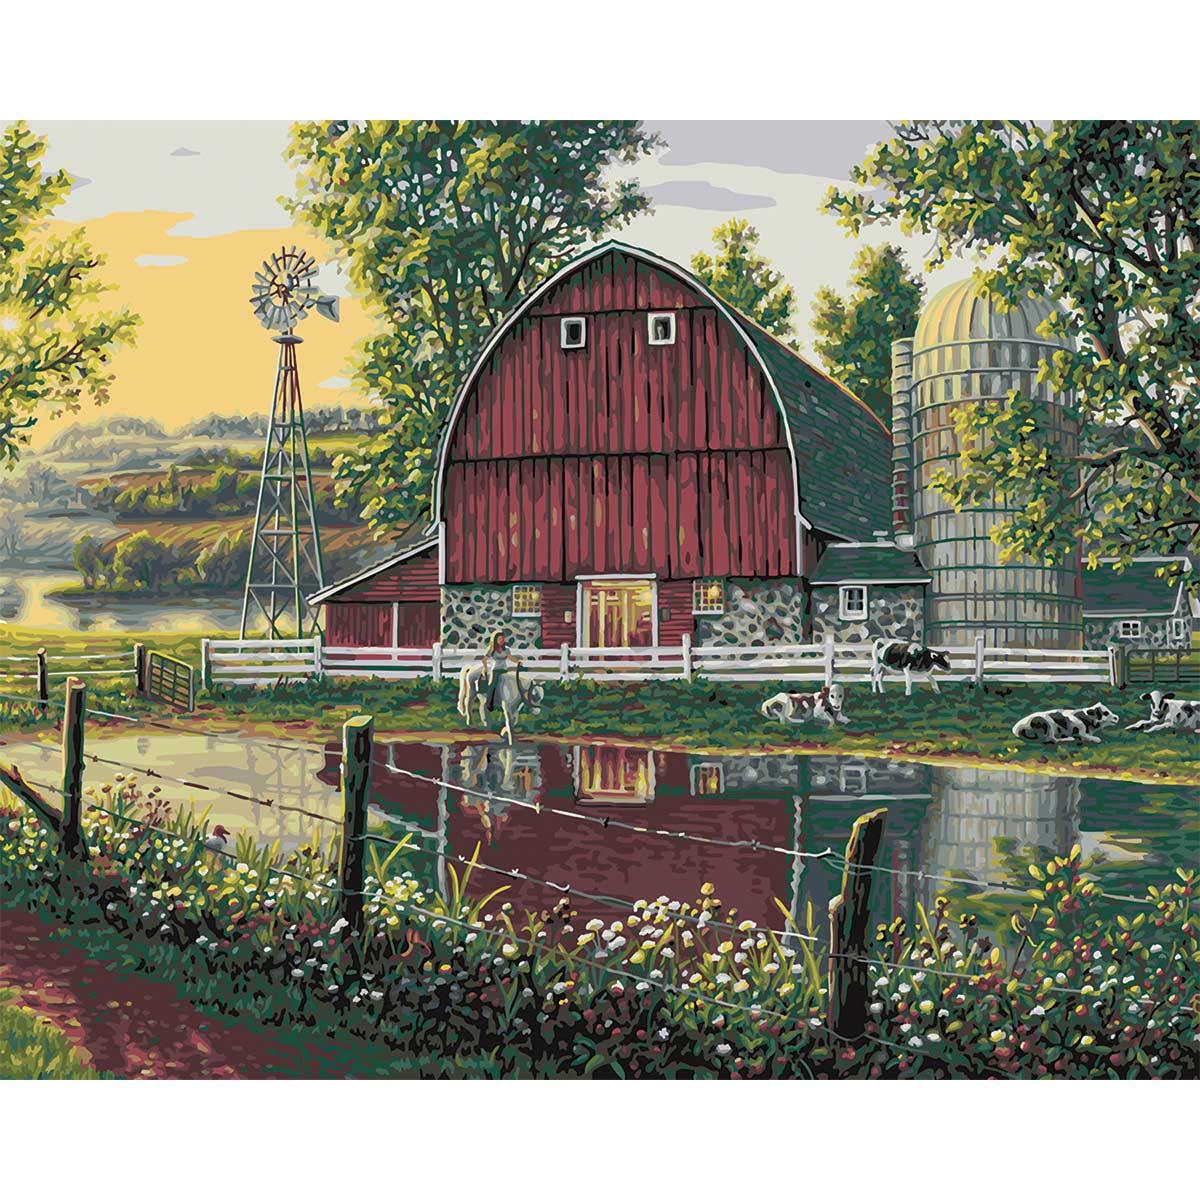 Plaid ® Paint by Number - Barnyard Memories